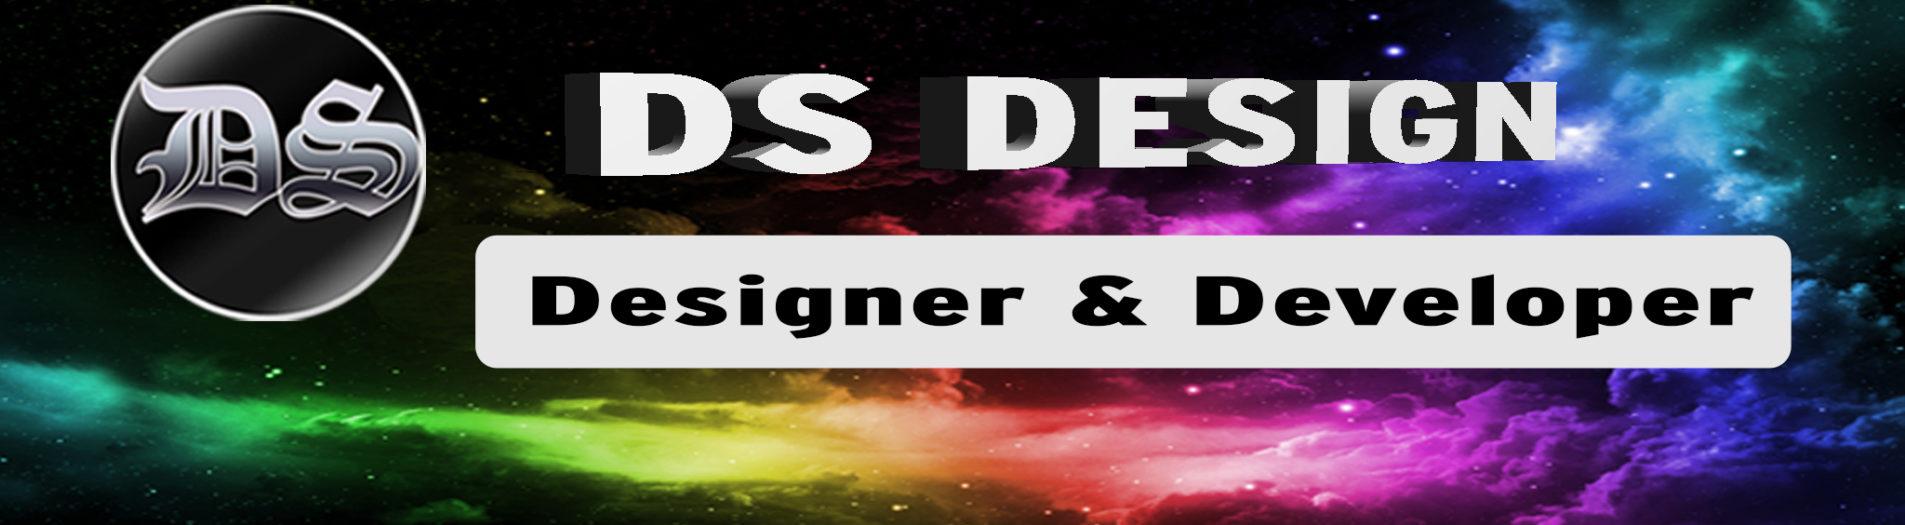 2e3f08b48ba DS DESIGN » GRAPHIC DESIGNER, VIDEO / AUDIO EDITOR, WEB DESIGNER ...